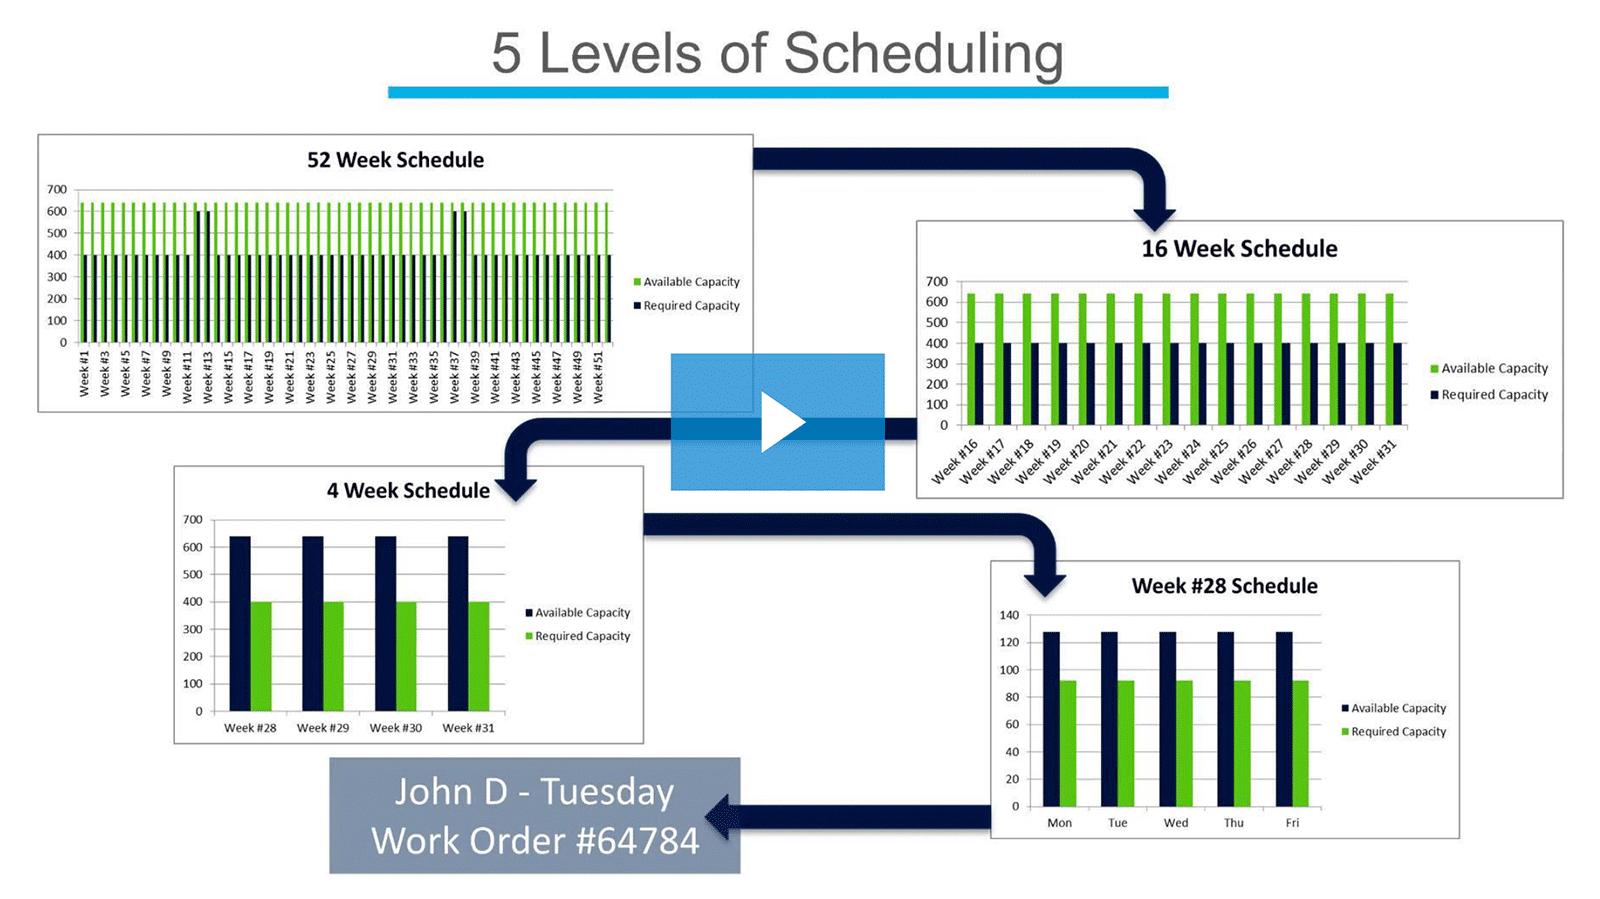 webinar-5-levels-scheduling.png